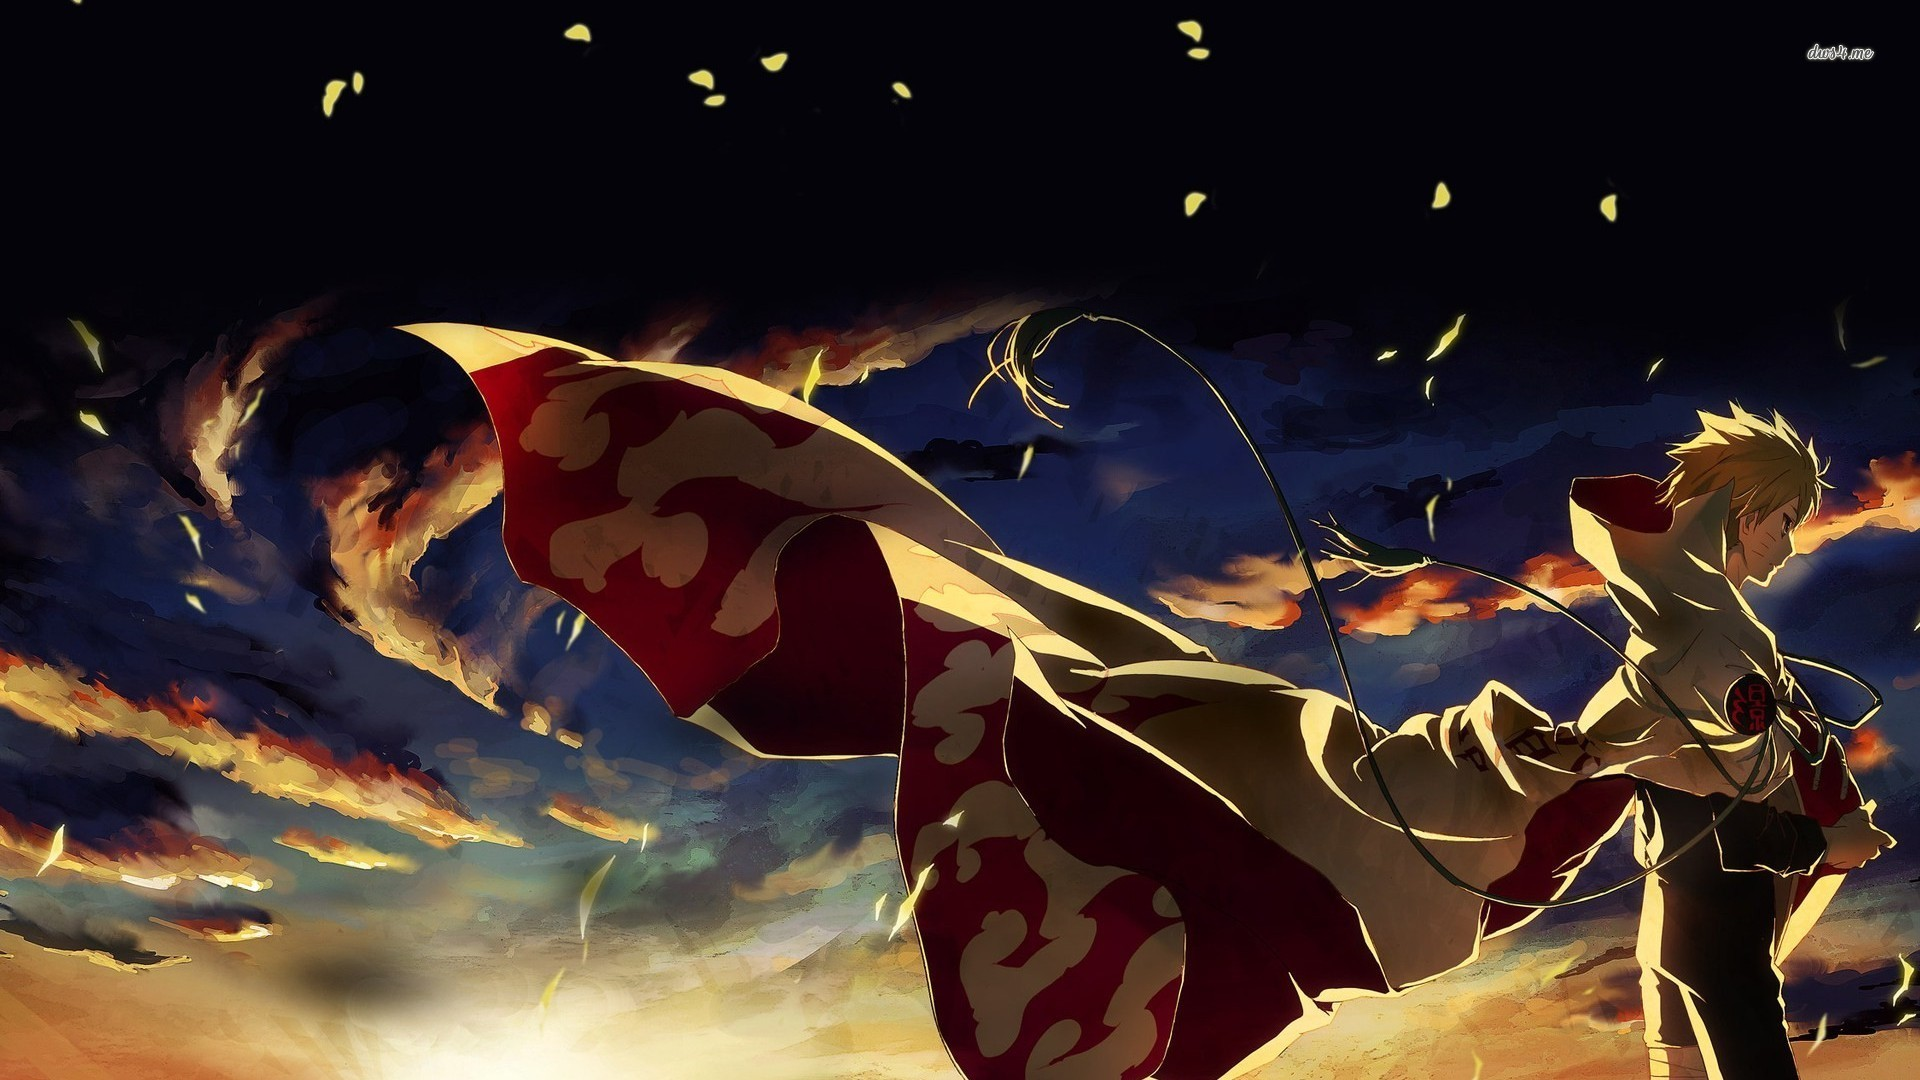 Naruto Shippuden Wallpaper Hokage 58 Pictures